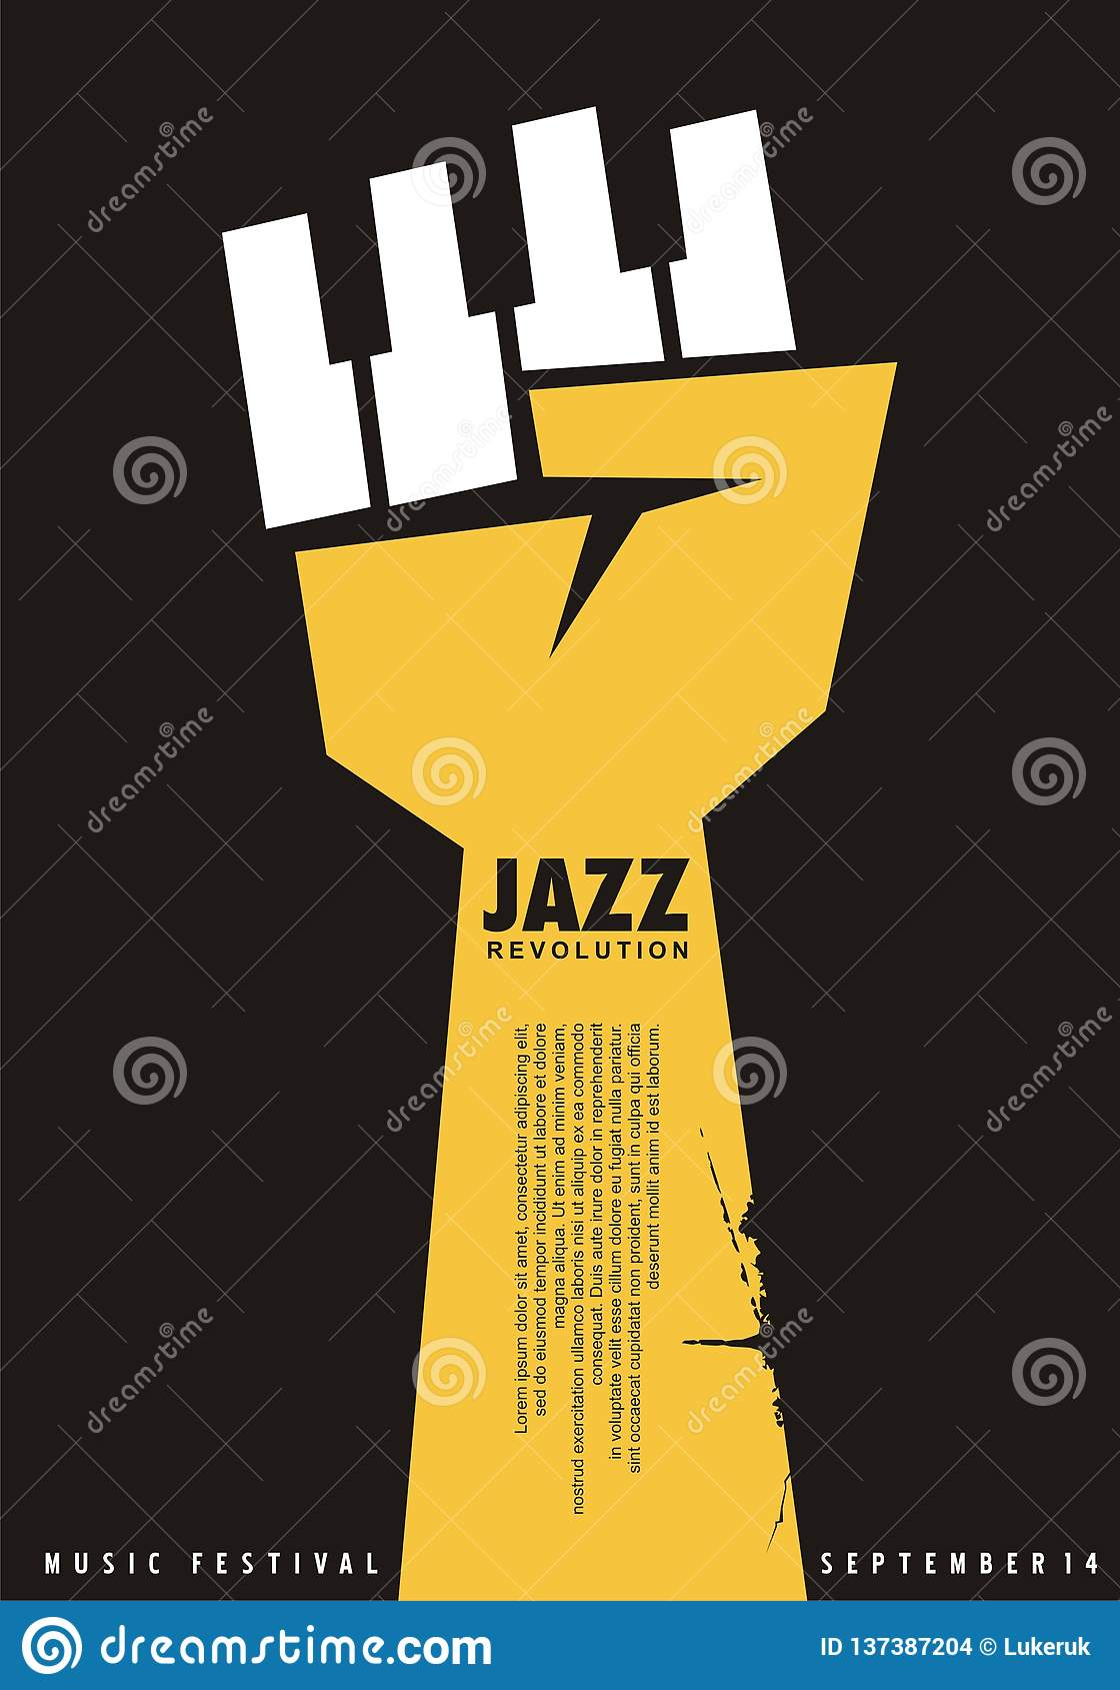 eu sunt dating jazz